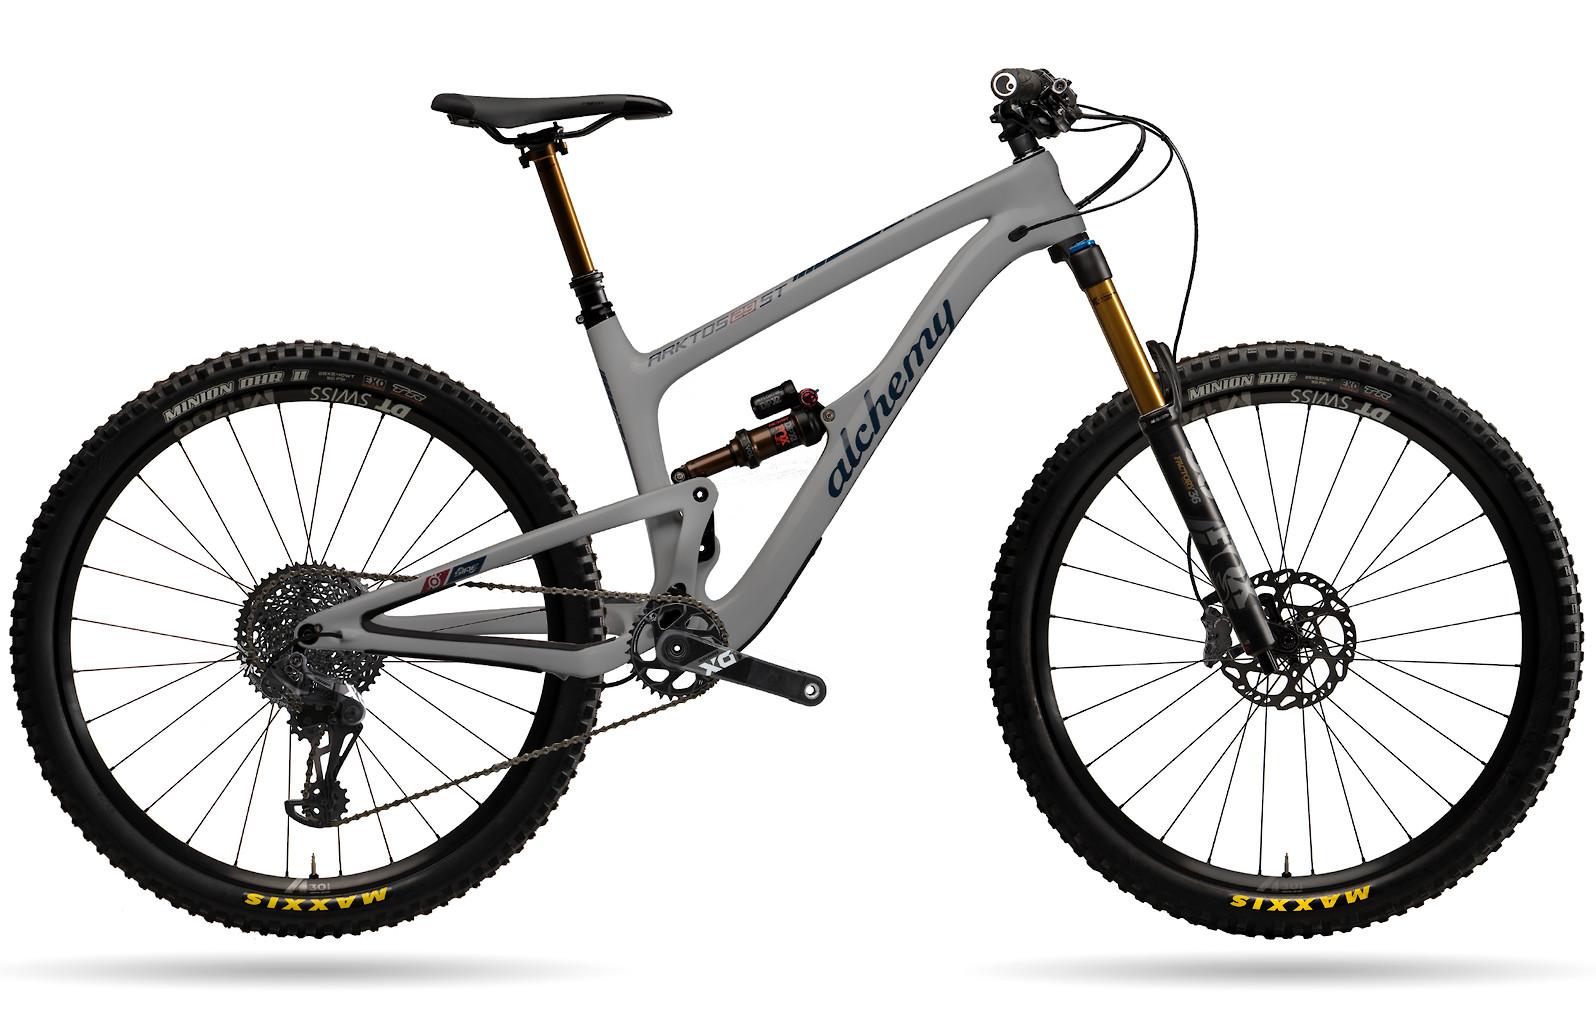 2019 Arktos 29 ST Grey X01 Eagle Build